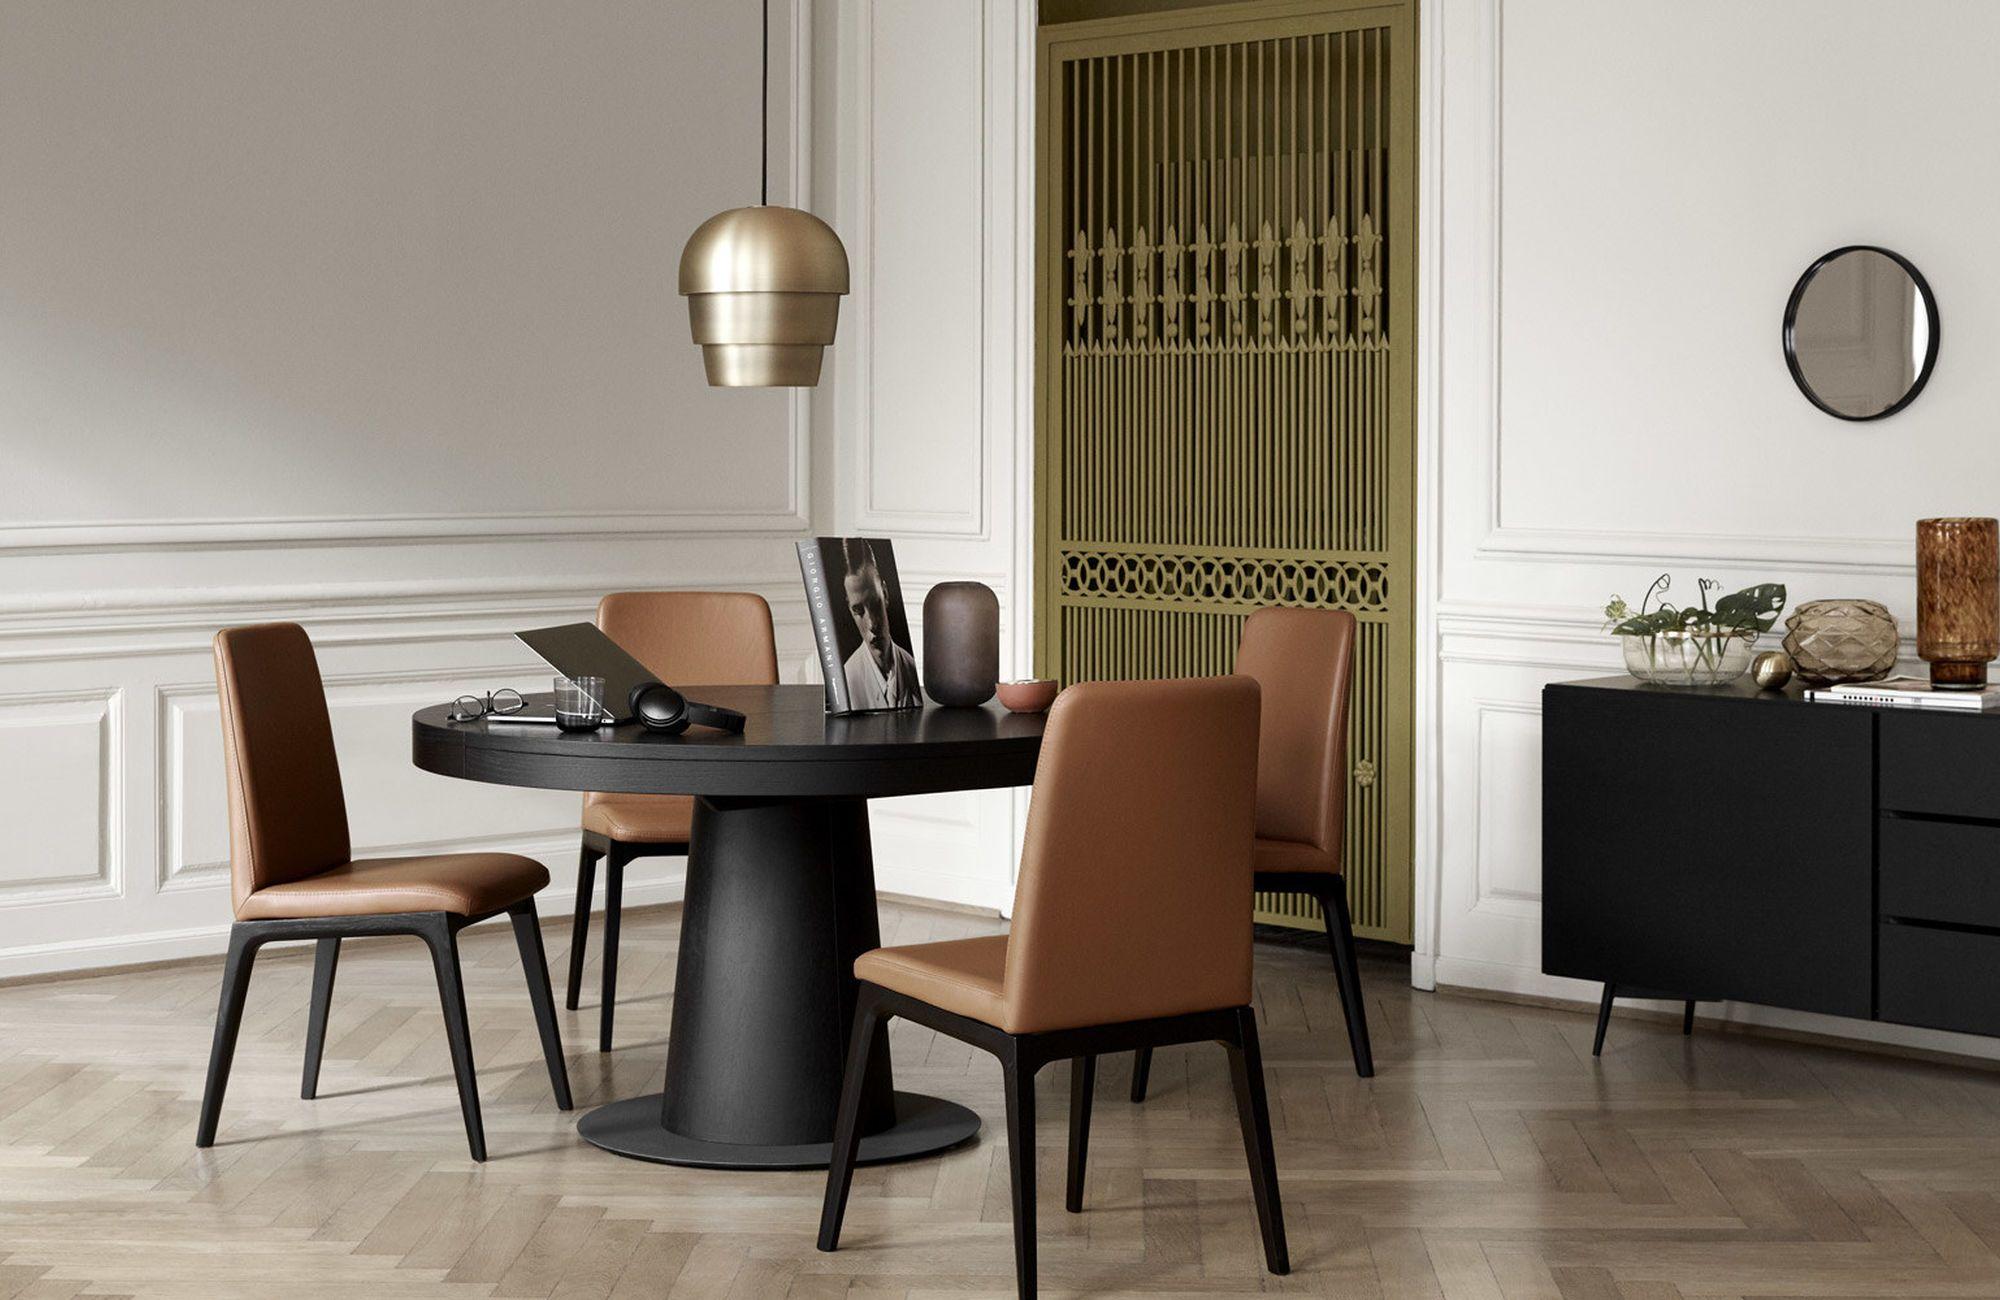 Rozkladane Stoly Do Jadalni Stol Granada Z Dodatkowym Blatem Dining Chairs Extendable Dining Table Dining Room Contemporary